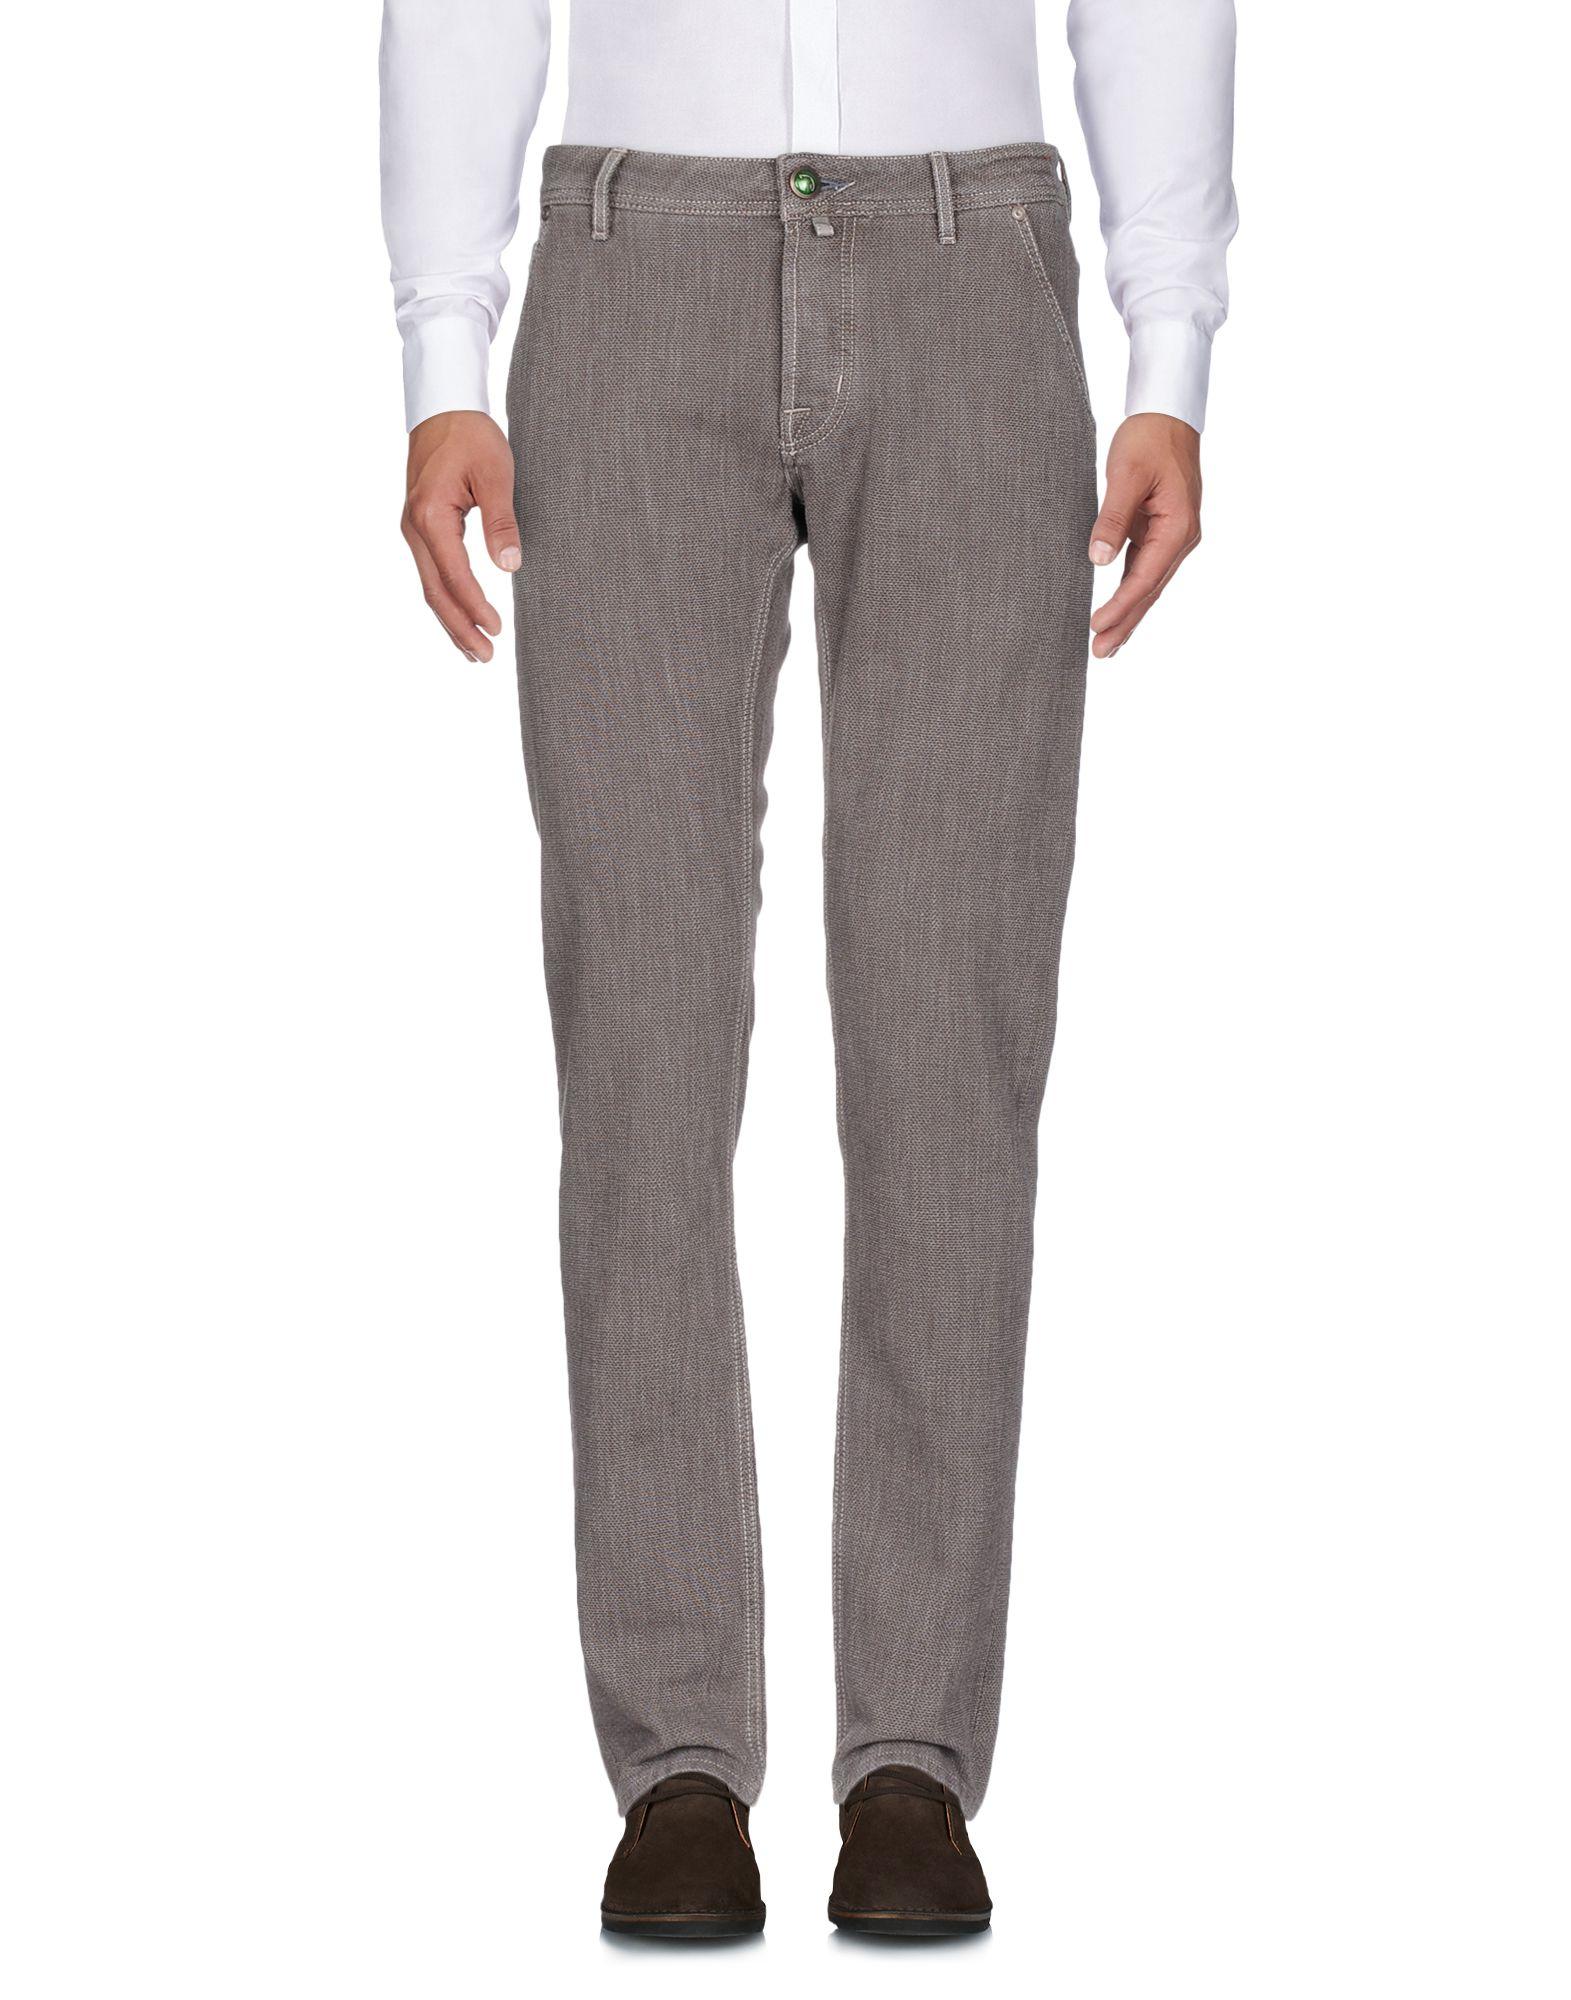 Pantalone Jacob Cohёn Donna - Acquista online su